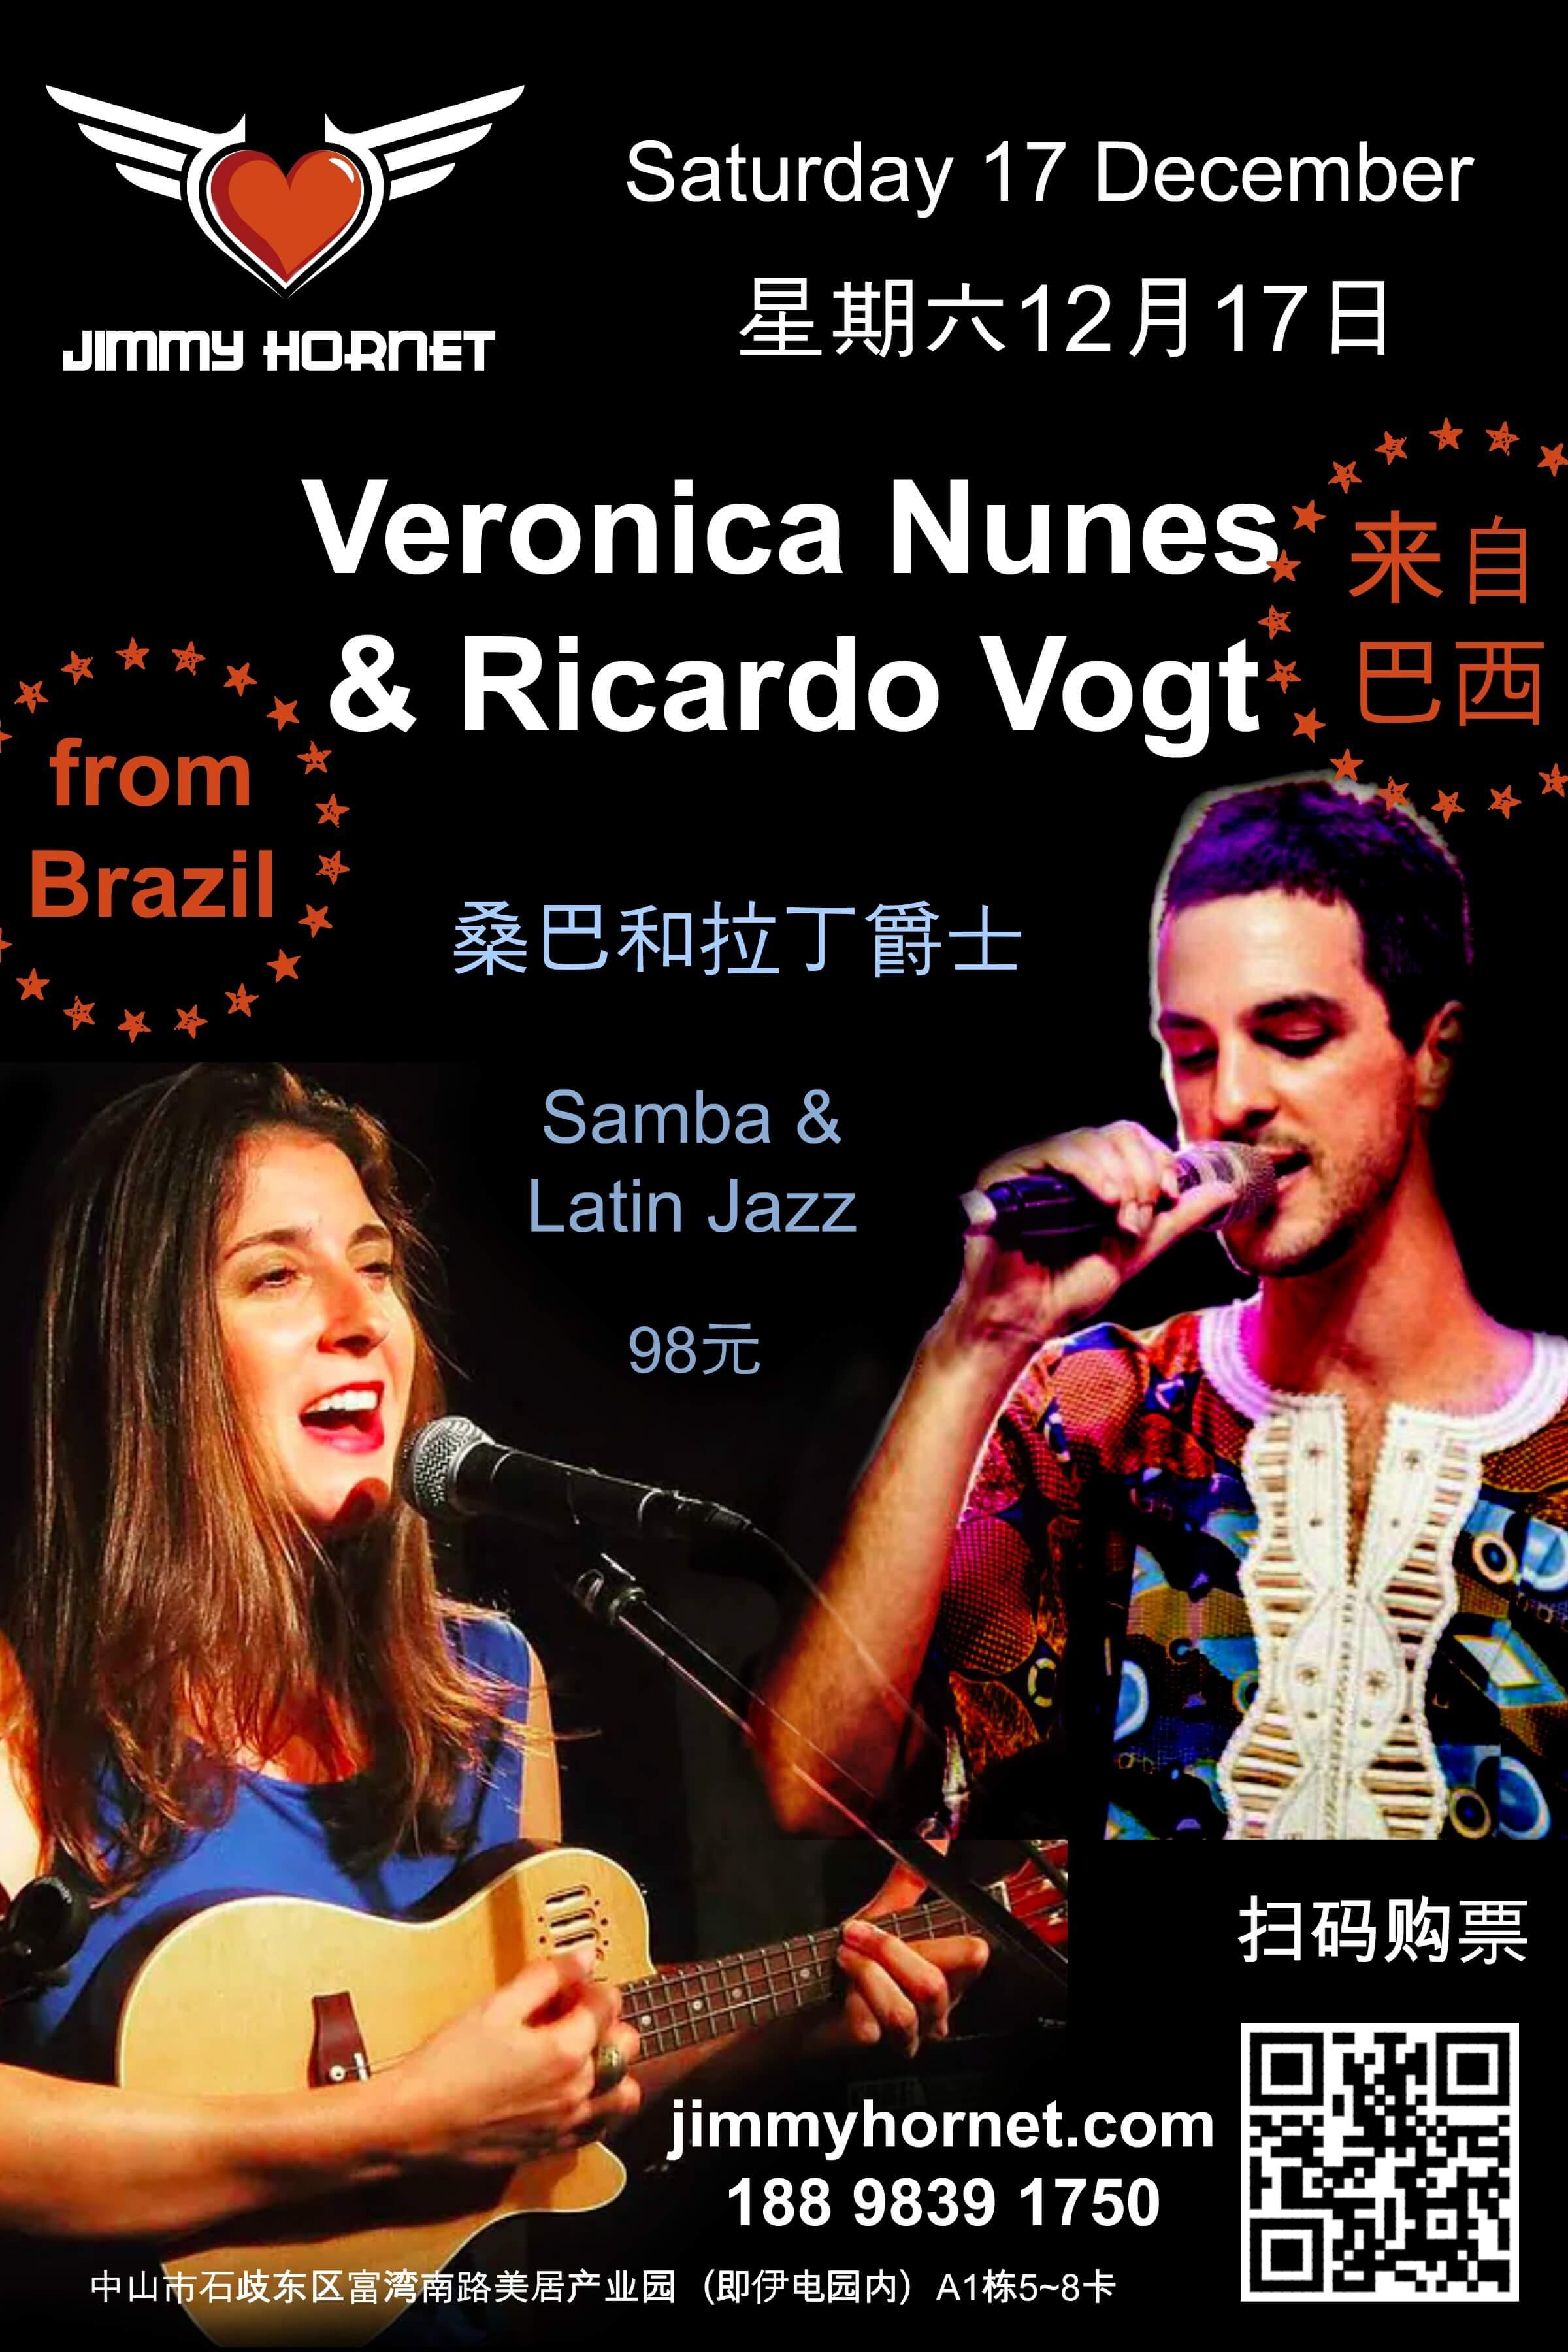 Veronica Nunes and Ricardo Vogt perform at Jimmy Hornet